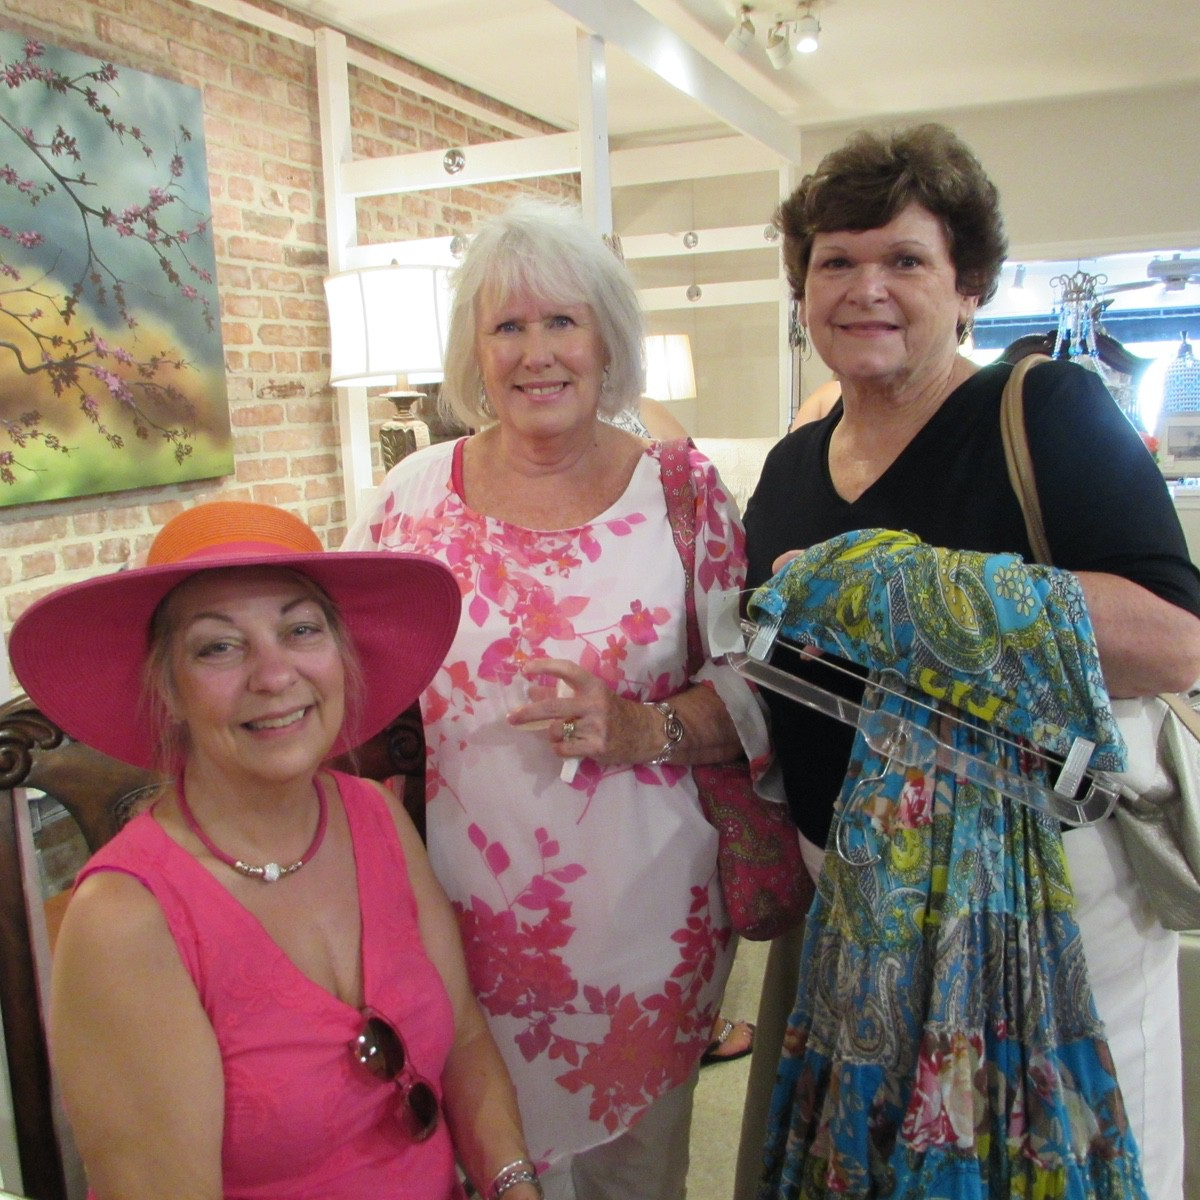 Katherine Nissen, Sherri Beecroft and Linda Willis